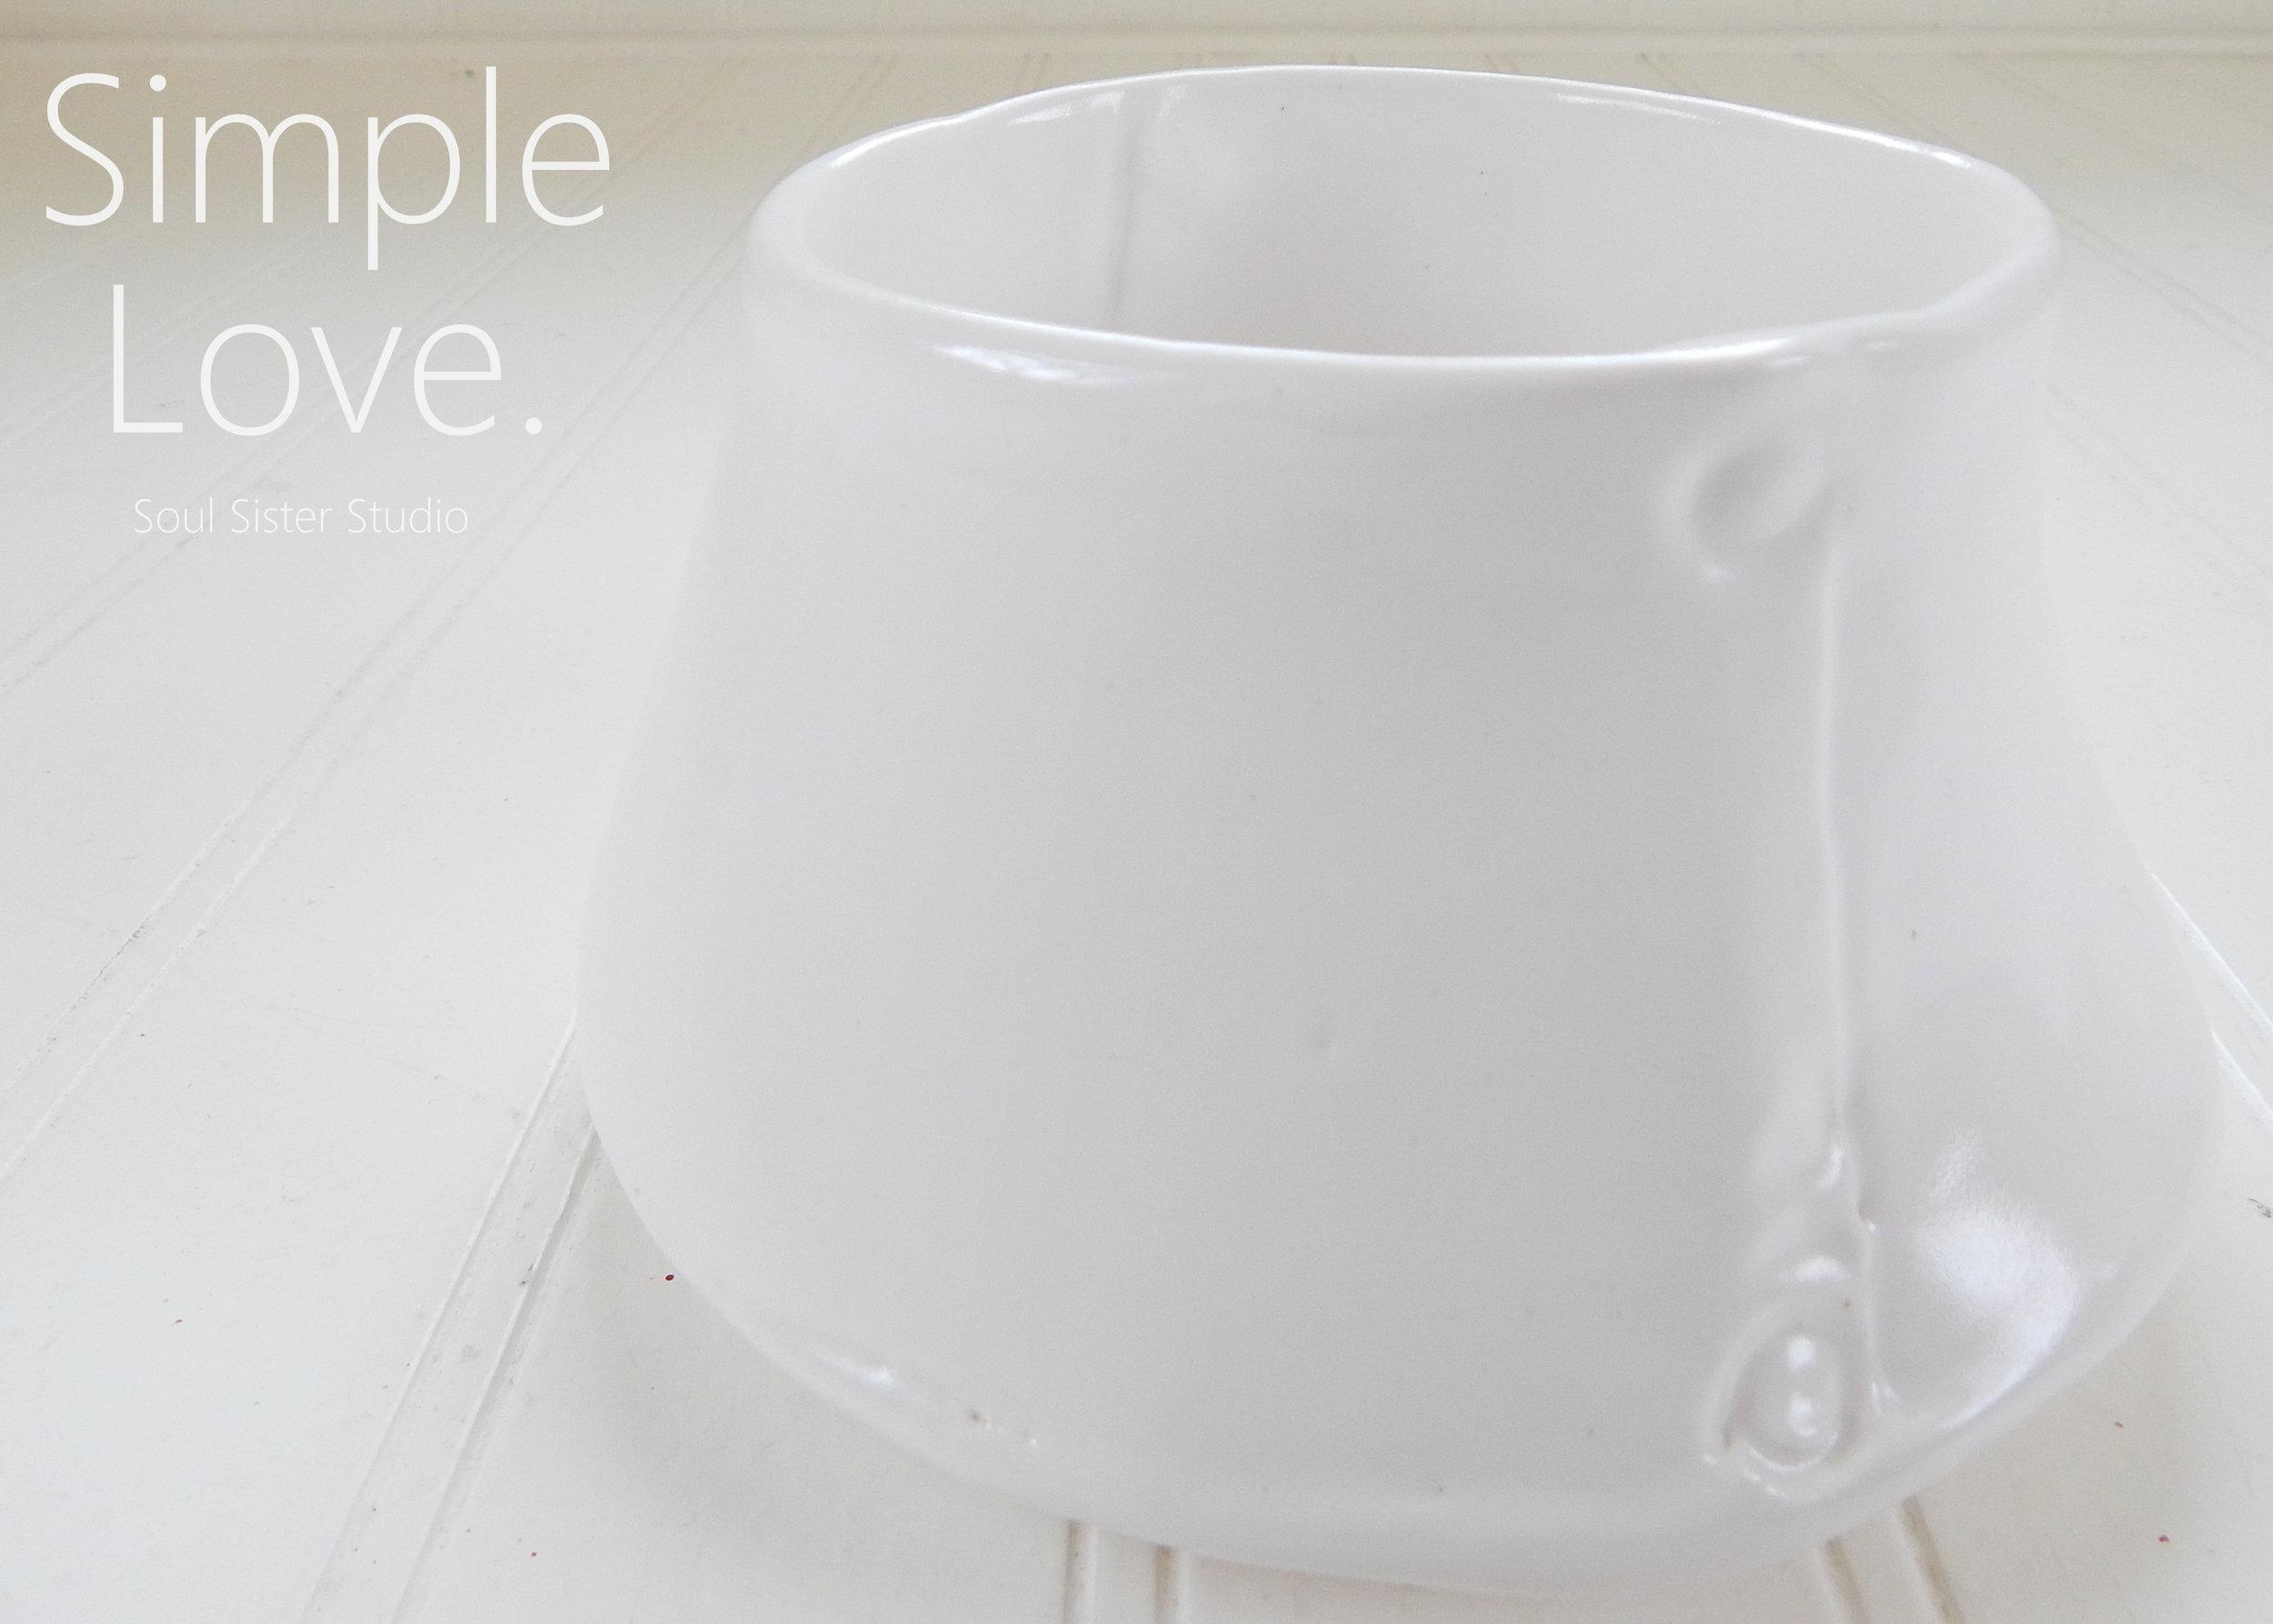 PotteryWhiteSimpleLove2.jpg